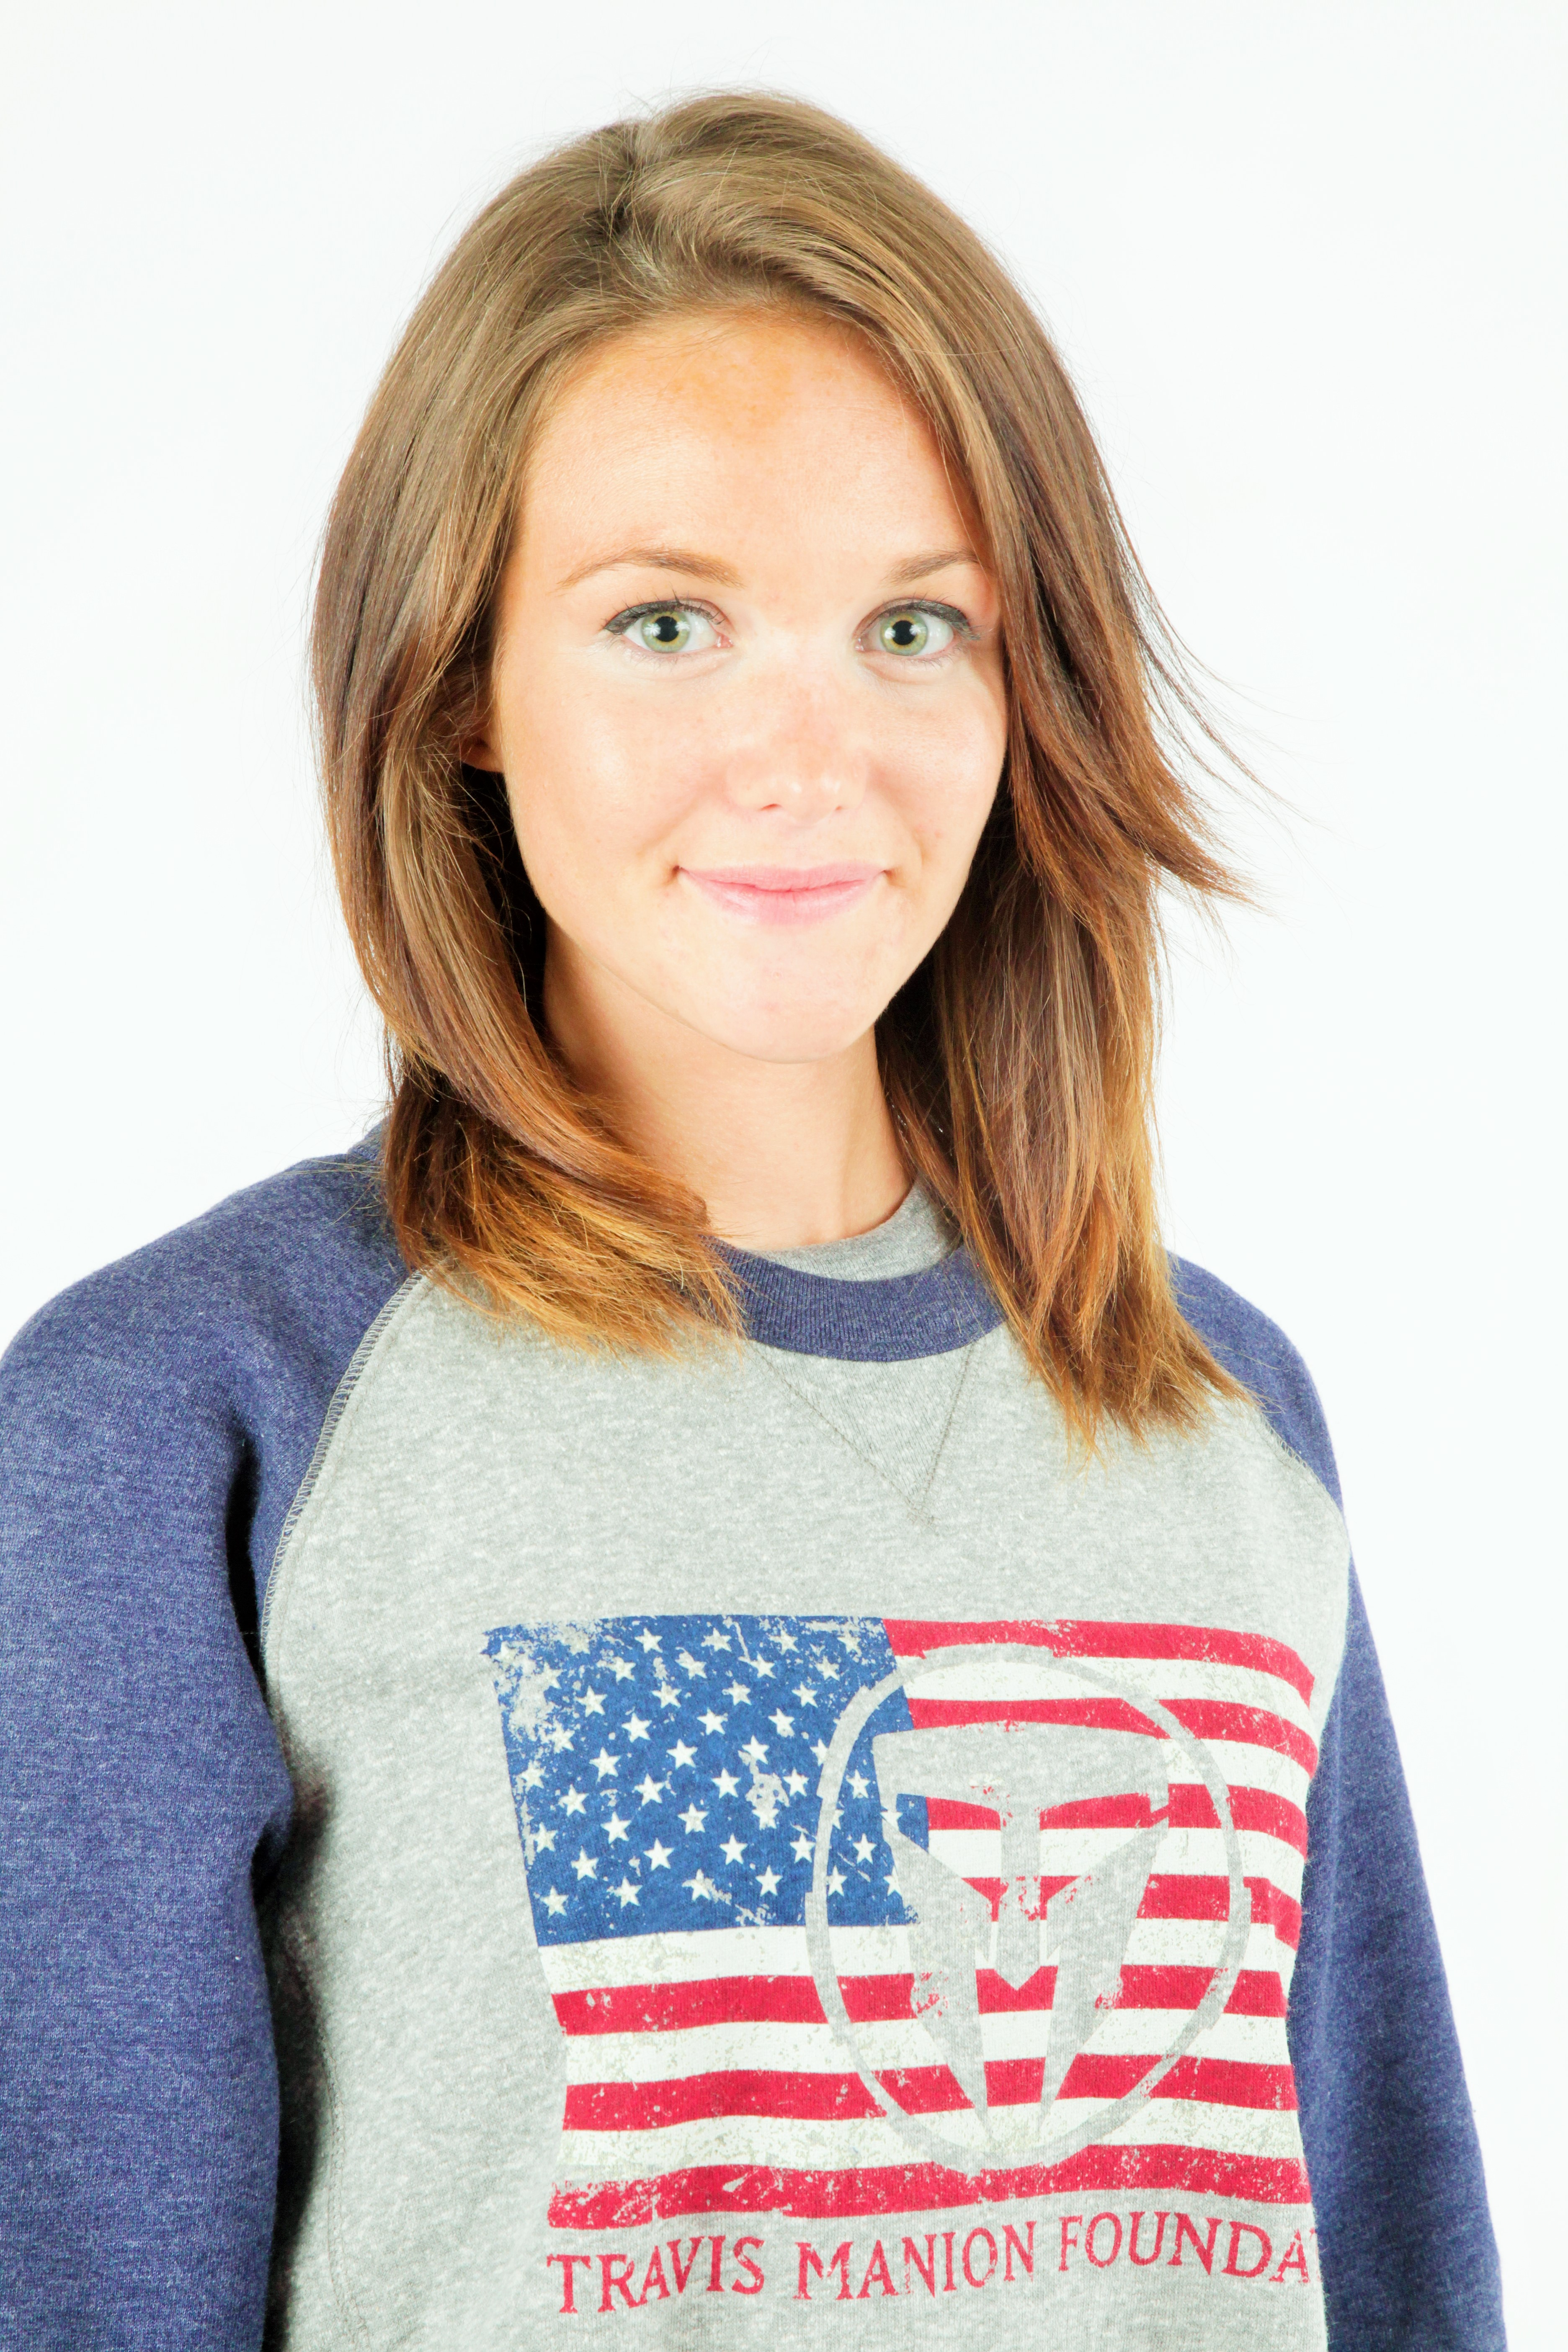 Unisex Tri-Blend TMF Sweatshirt